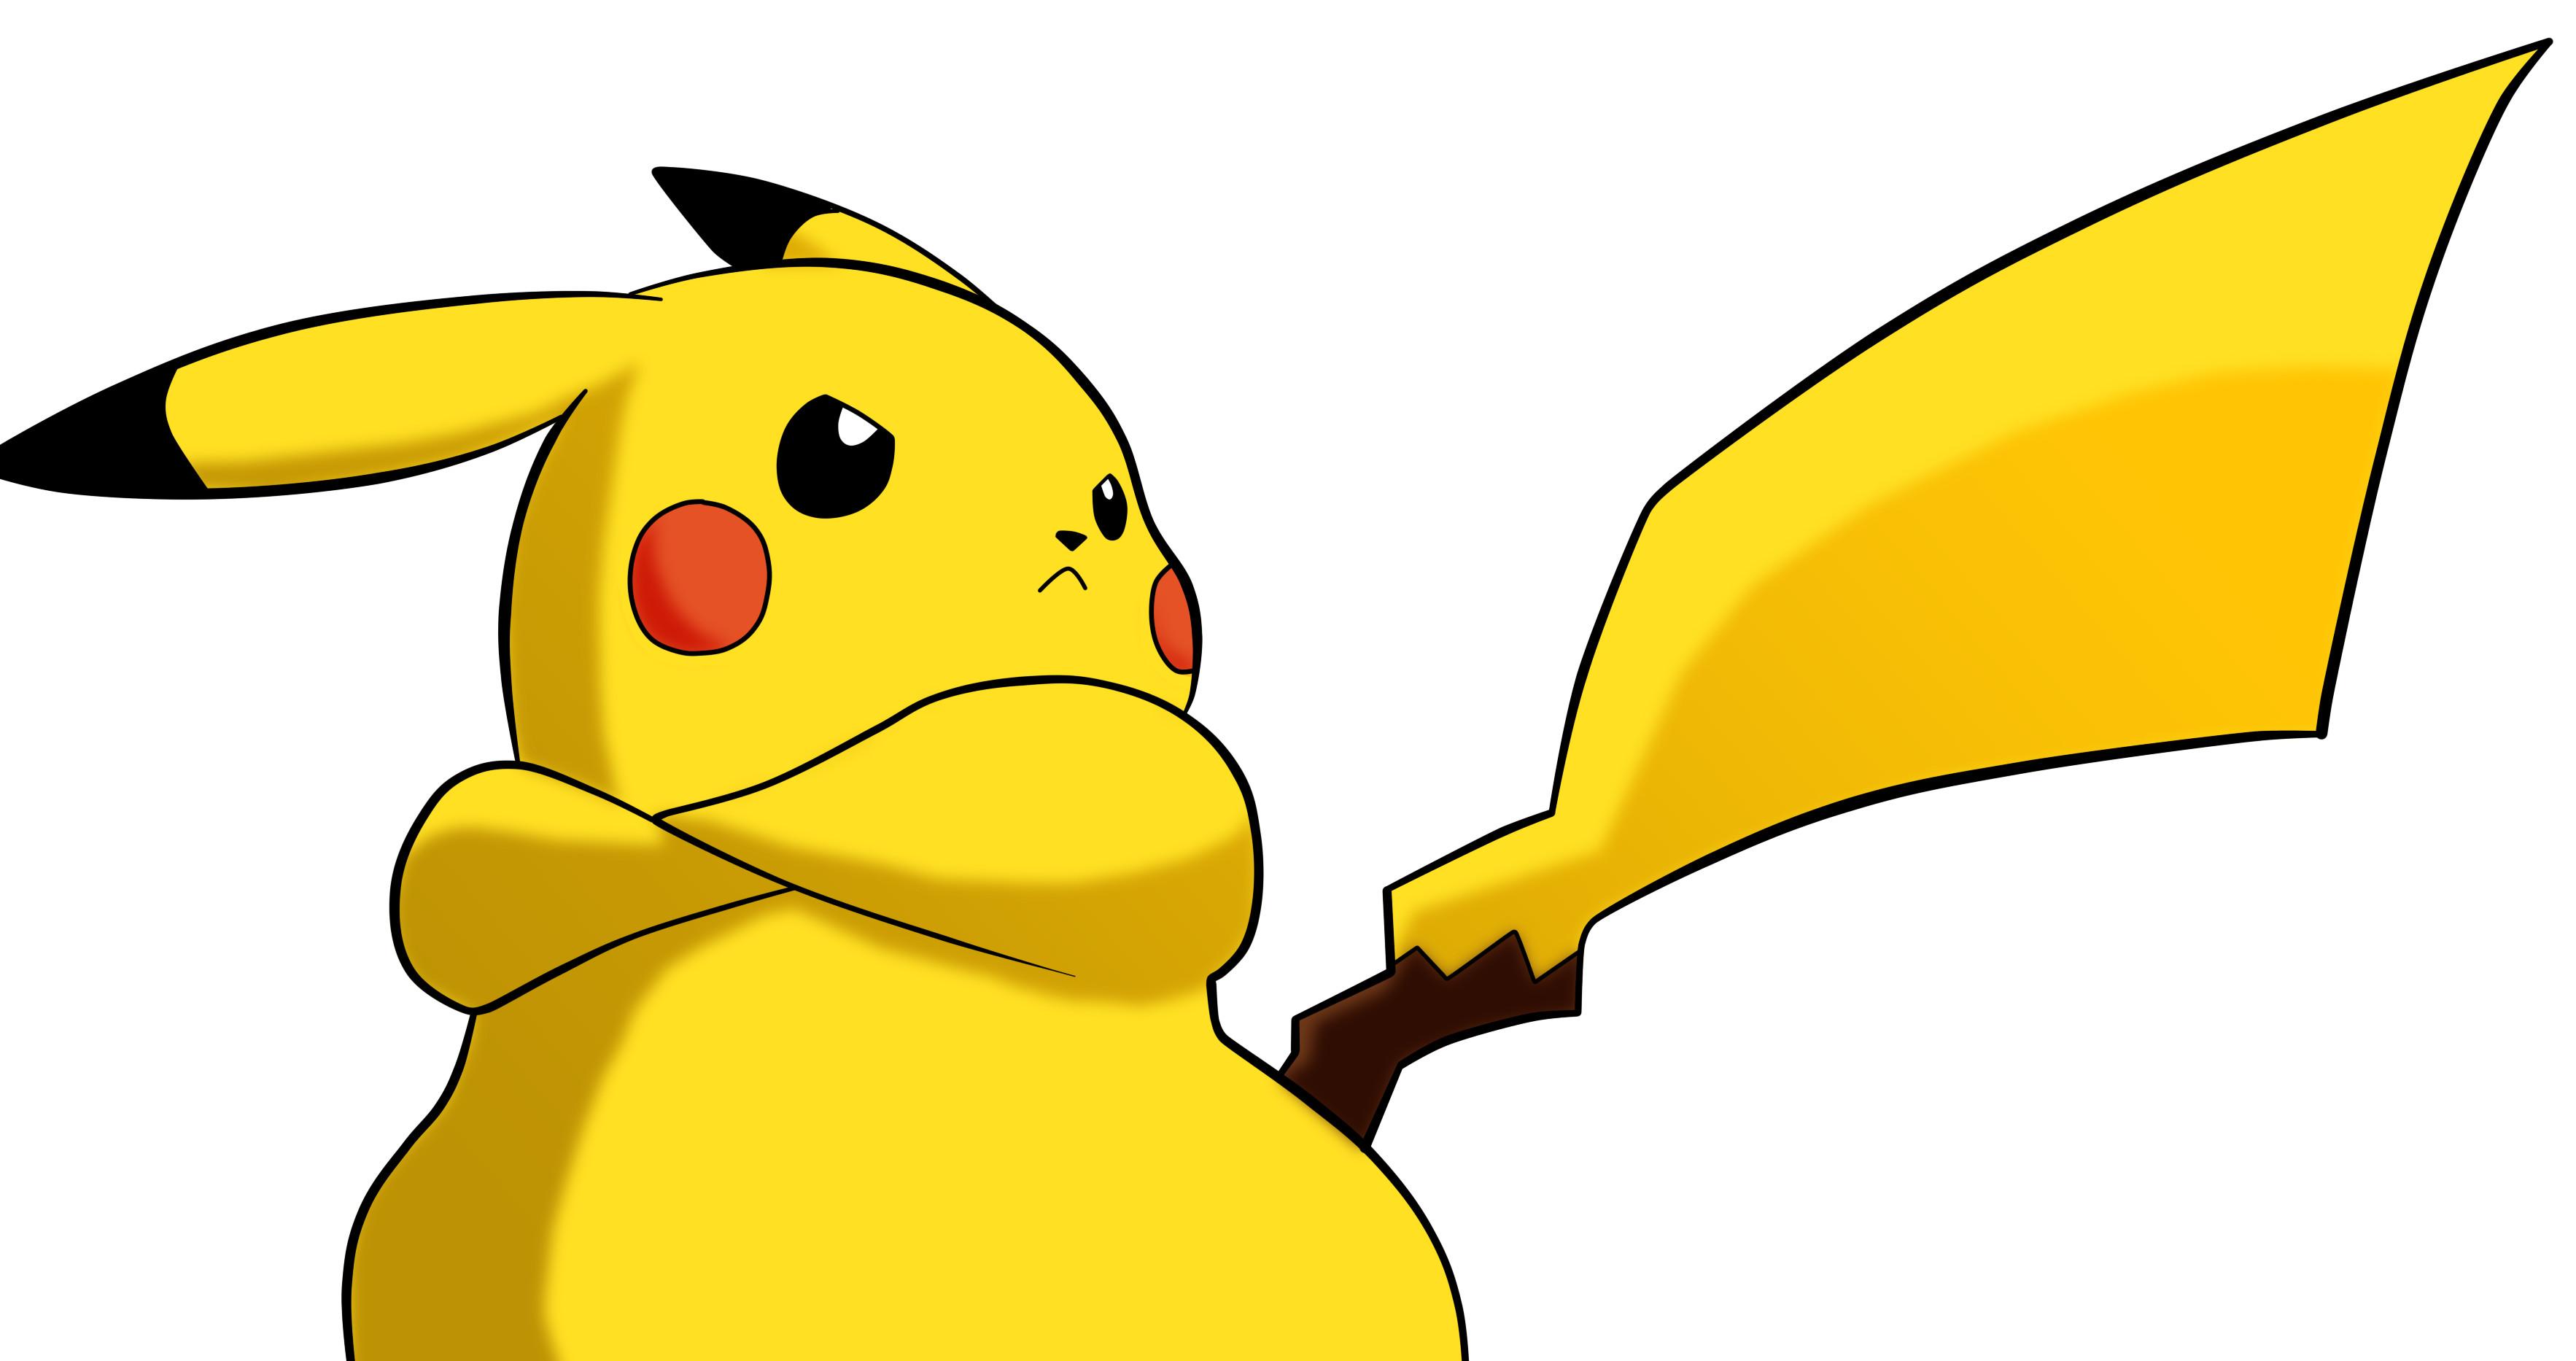 Angry Cute Pikachu Pokemon Wallpaper